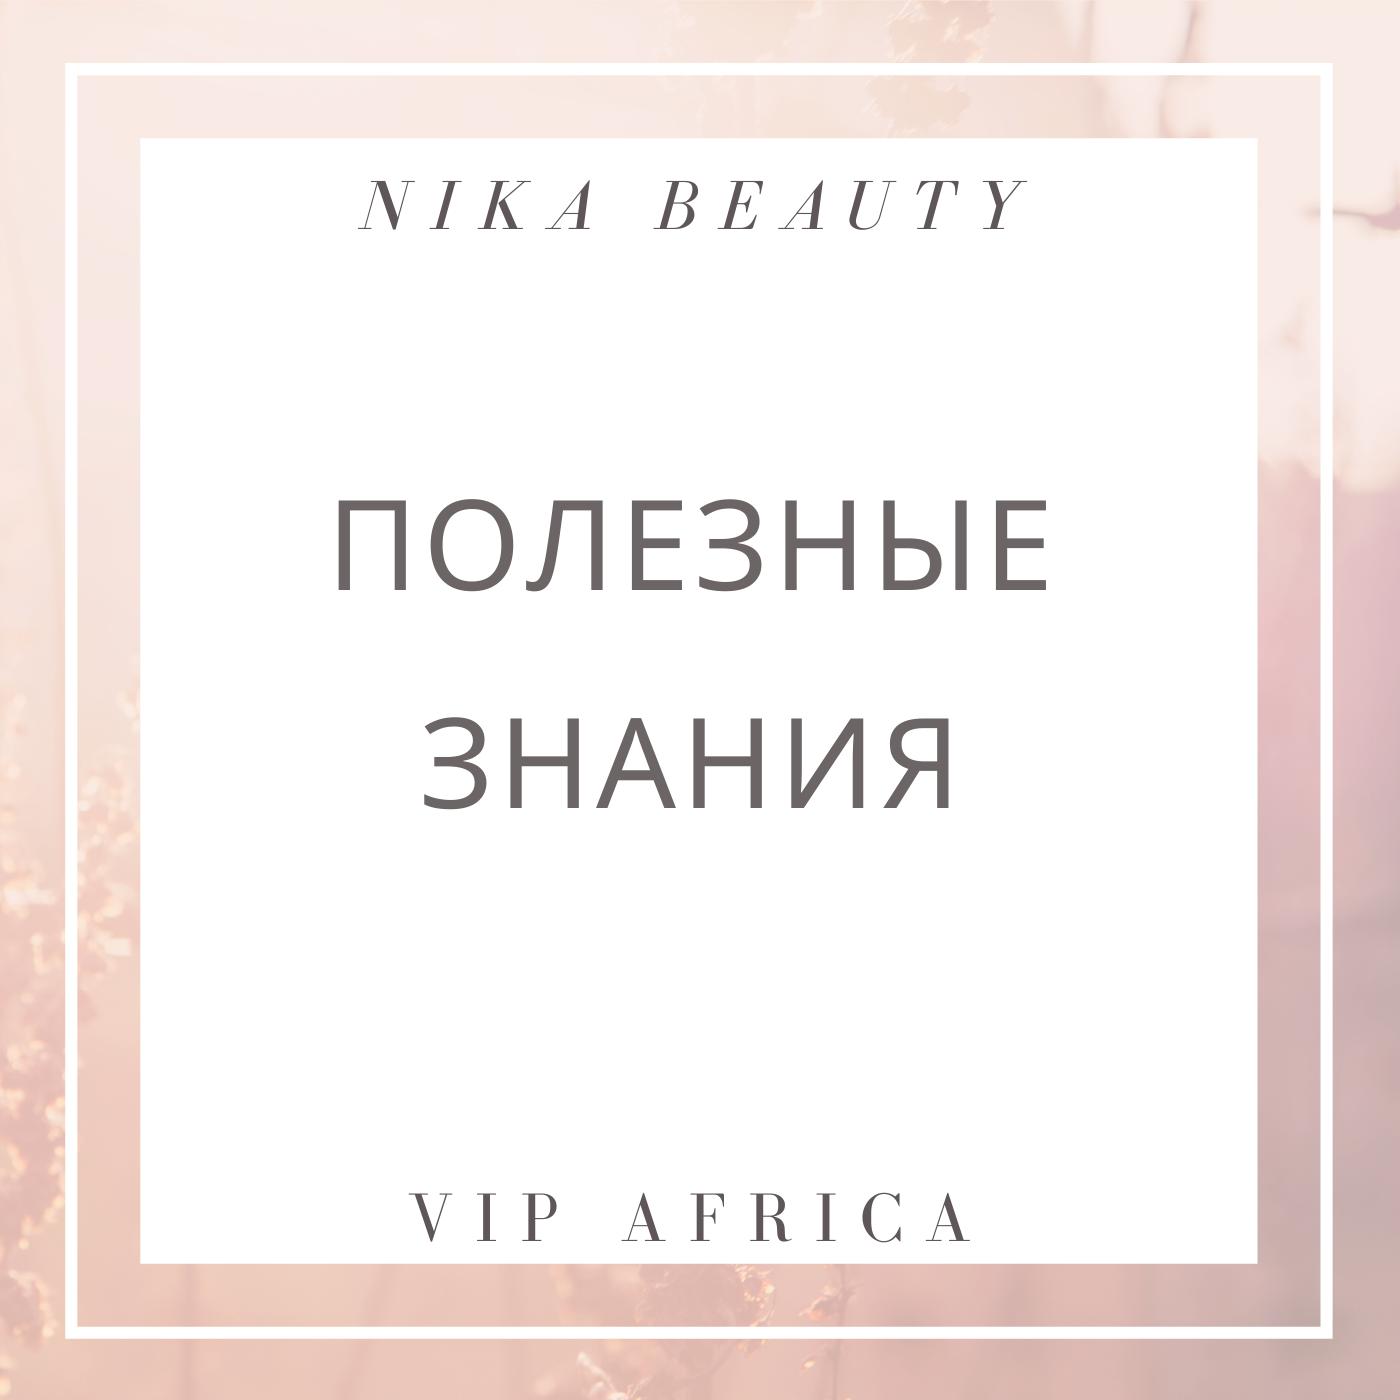 курсы косметолог в салонох Ника и Африка